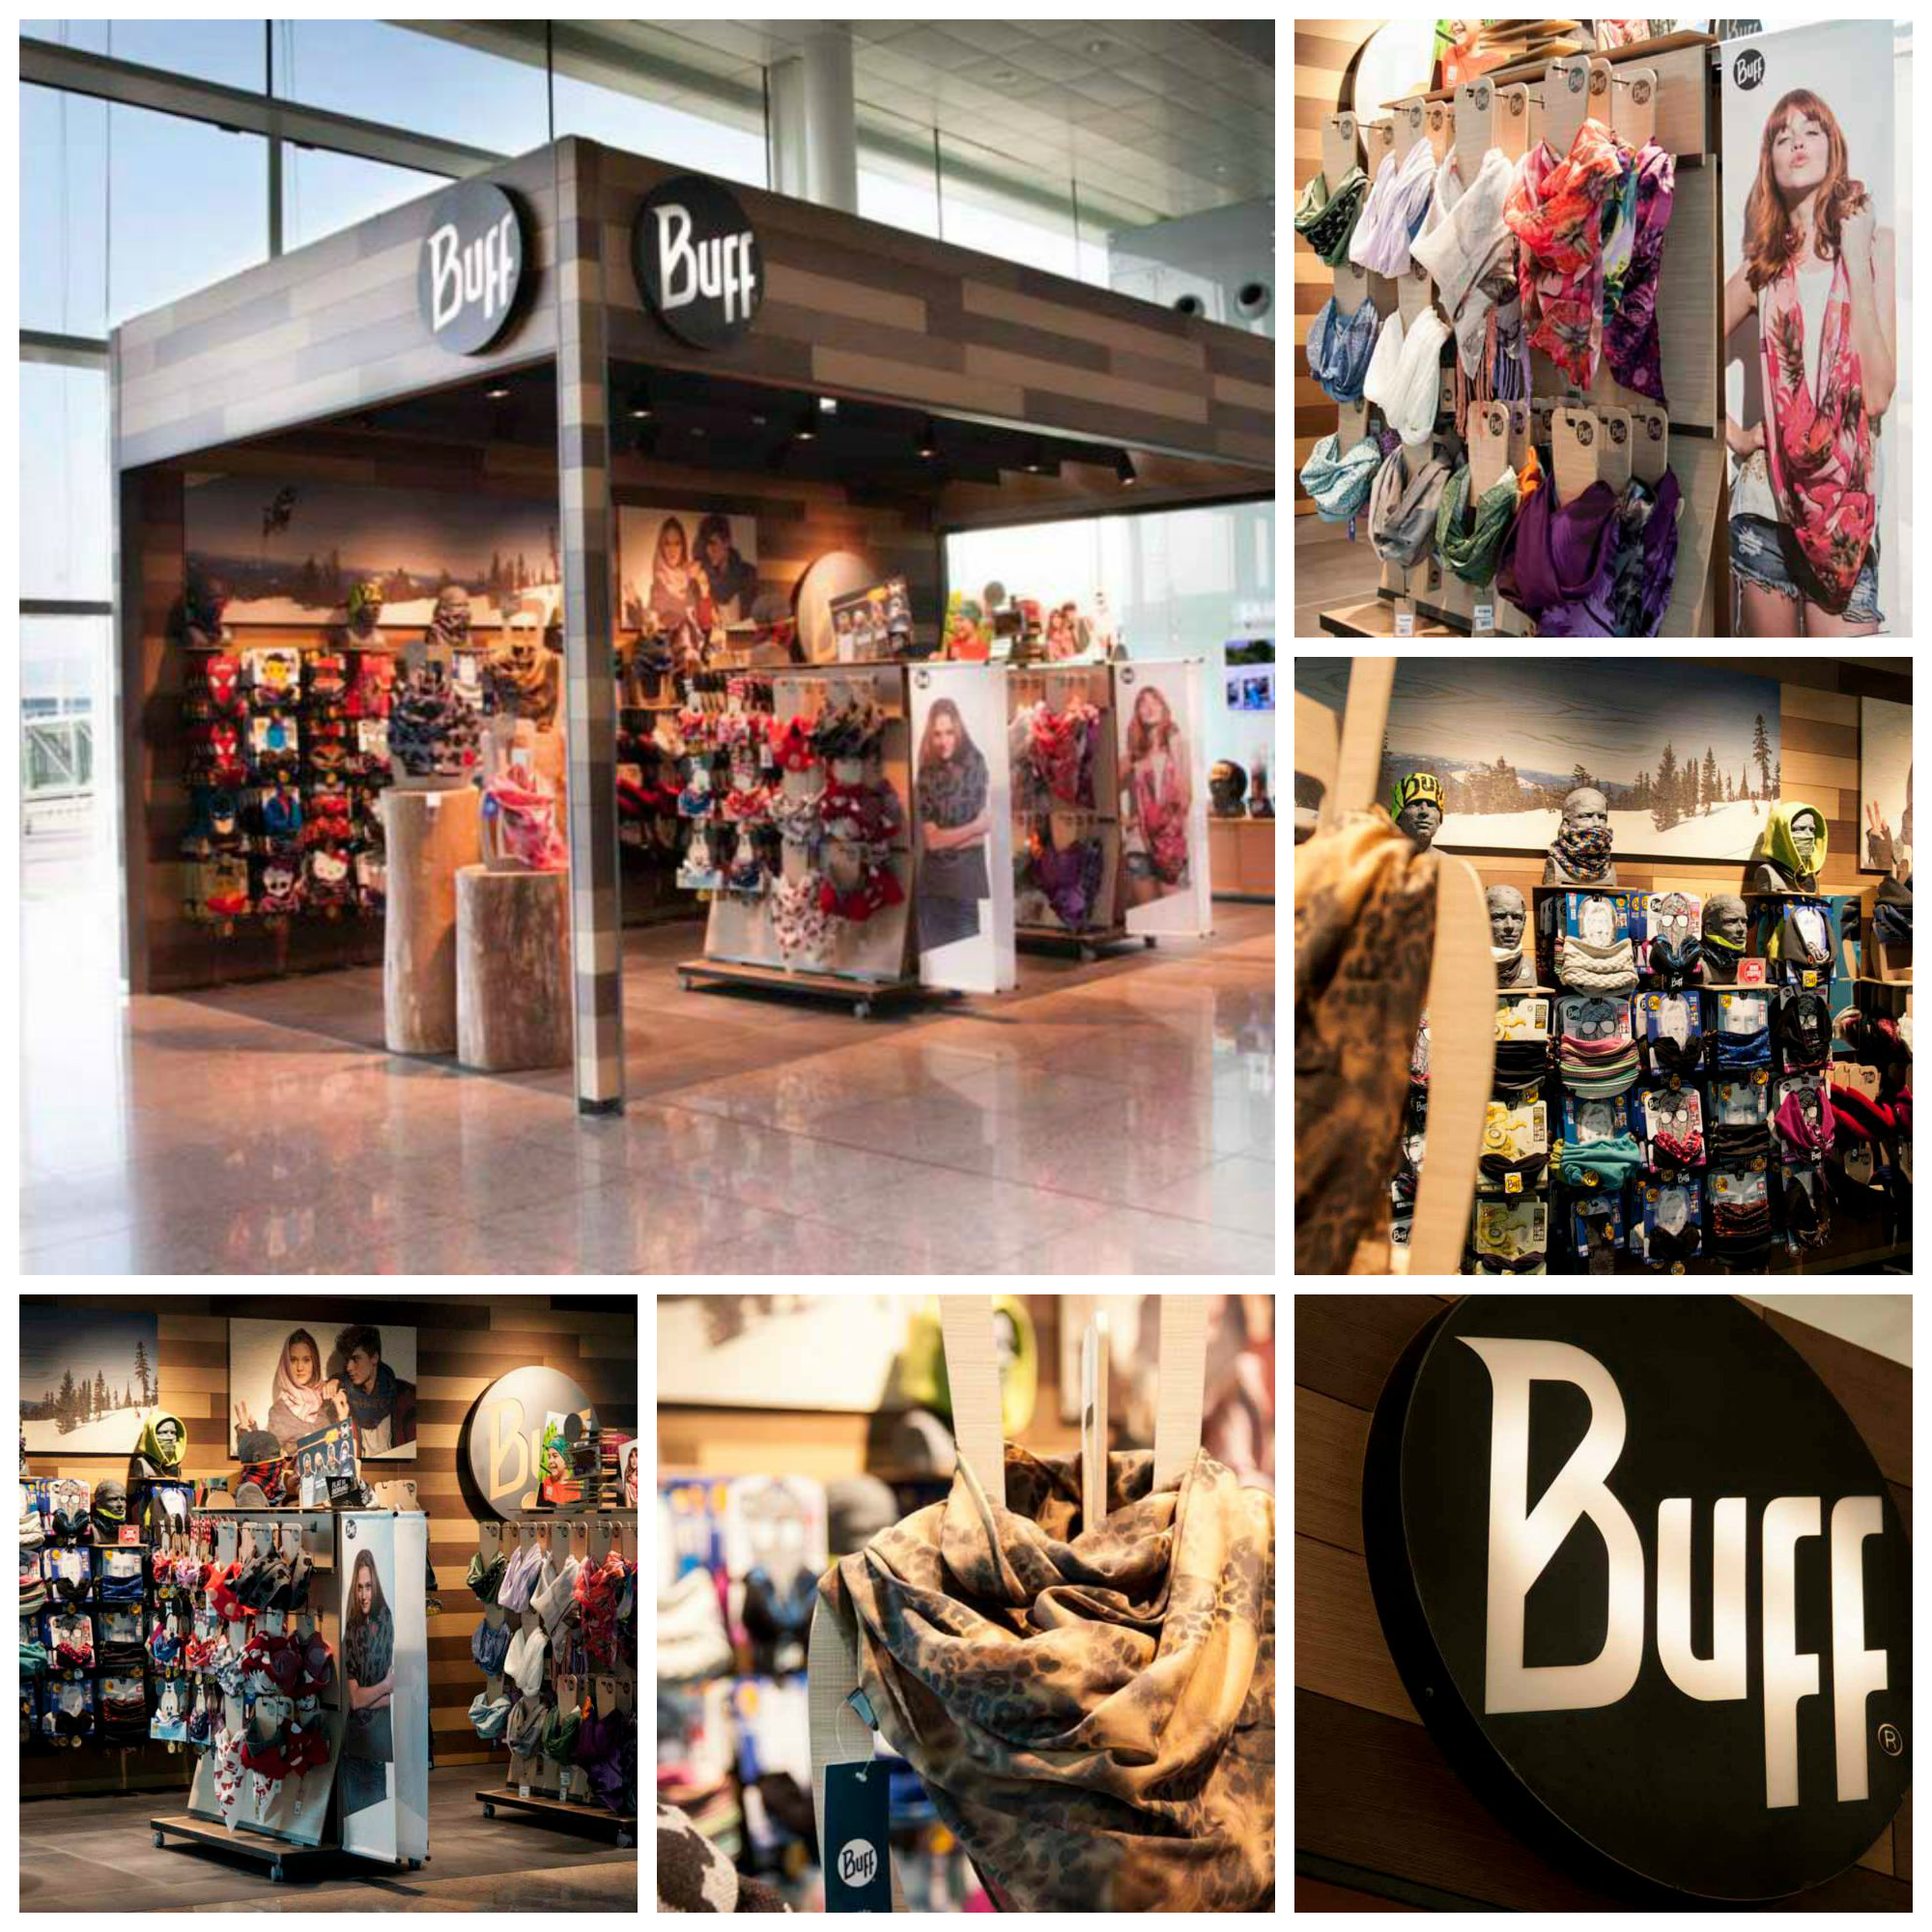 Untado Contemporáneo cartucho  Buff, Inc. Opens Up Shop in the Barcelona Airport | Store window displays,  Open up, Buff